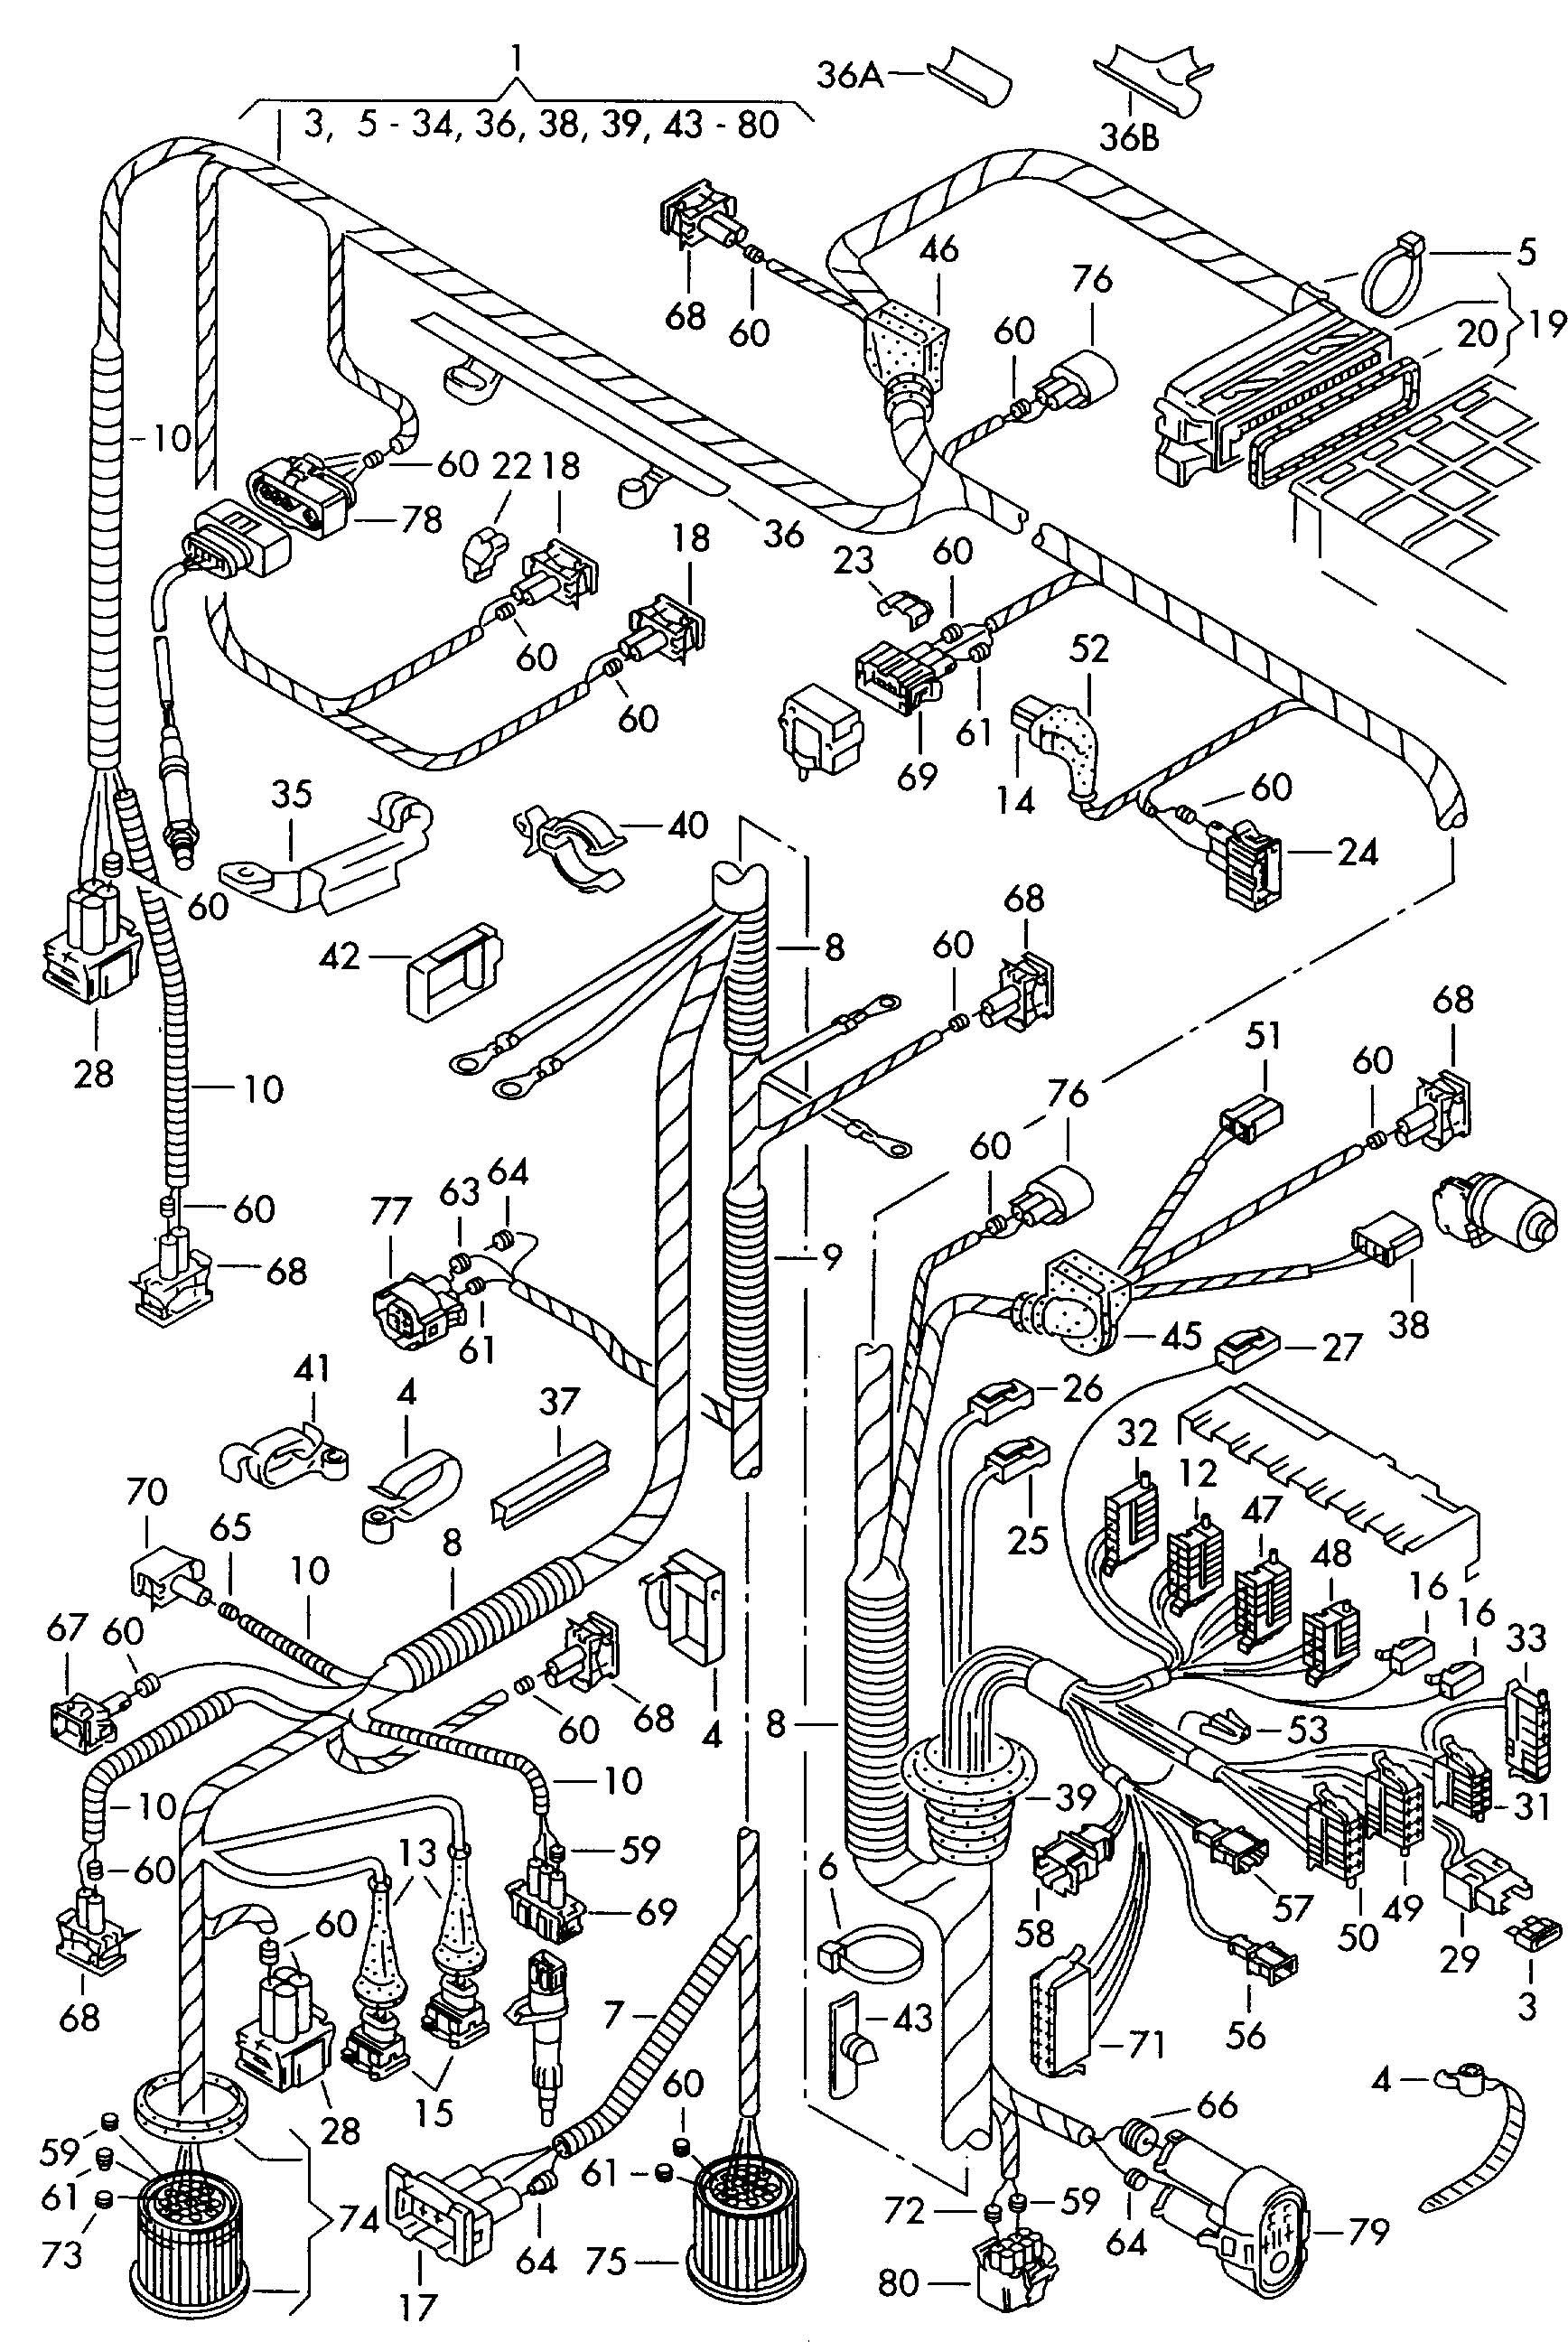 similiar vw engine parts diagram keywords vw tiguan engine parts diagram moreover 2002 vw cabrio engine diagram